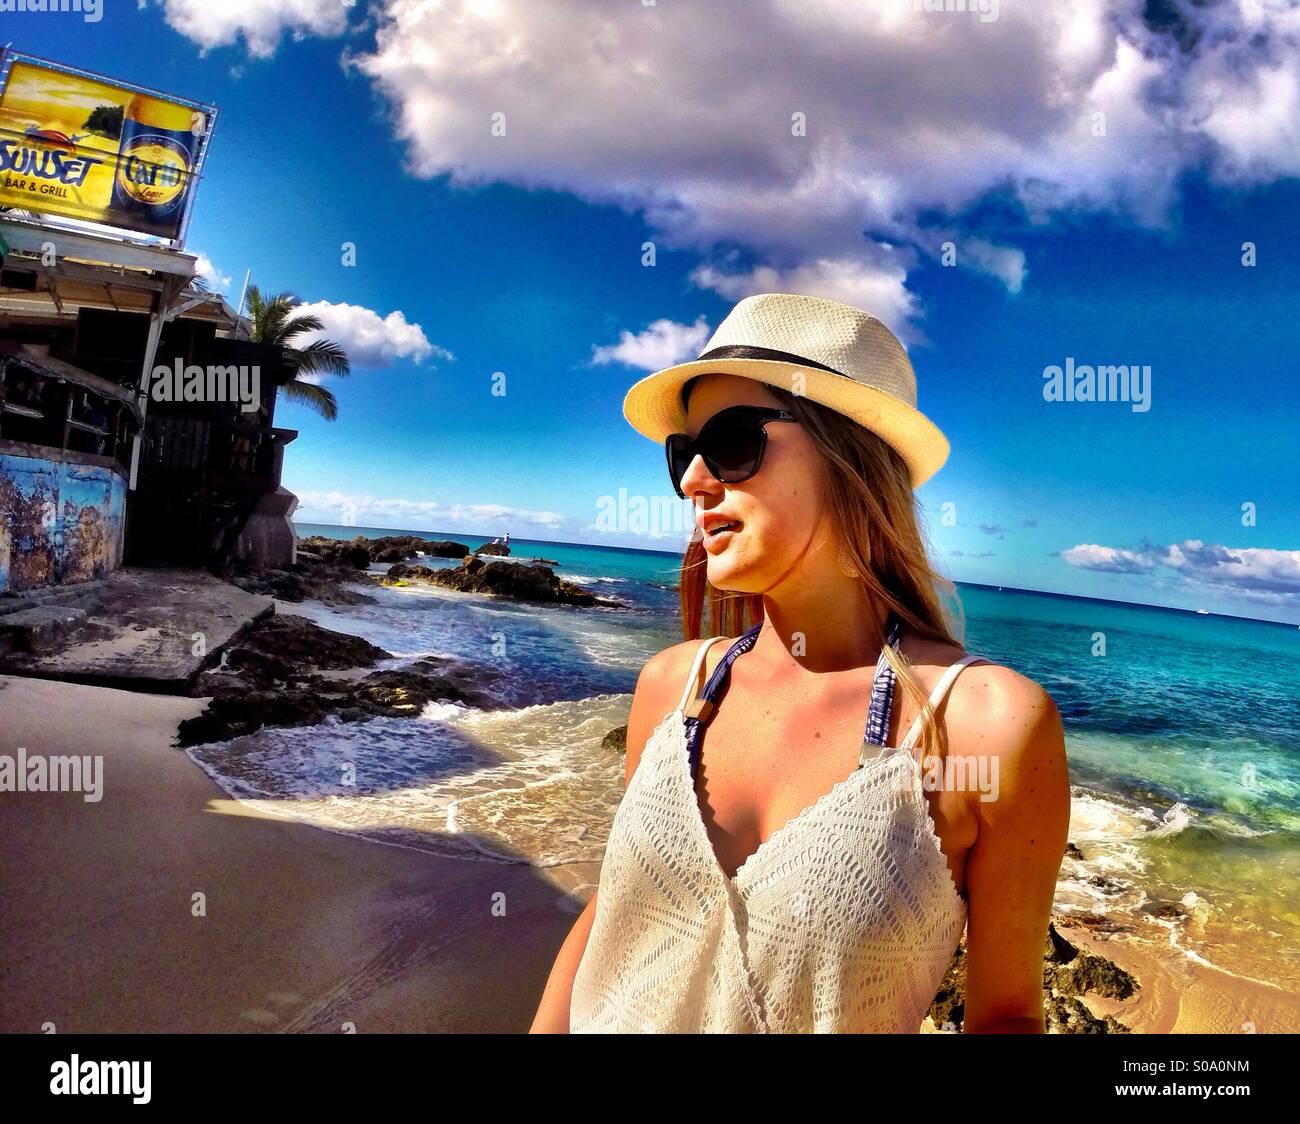 Estilo de vida caribeño, Saint Maarten islas - fashion , relajante, océano azul Imagen De Stock